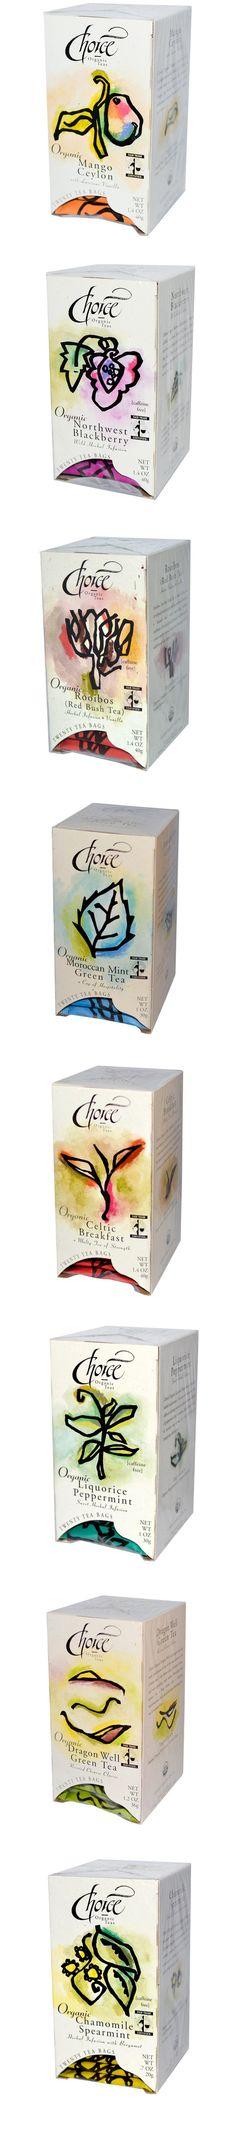 Choice Organic Tea   www.choiceorganicteas.com/